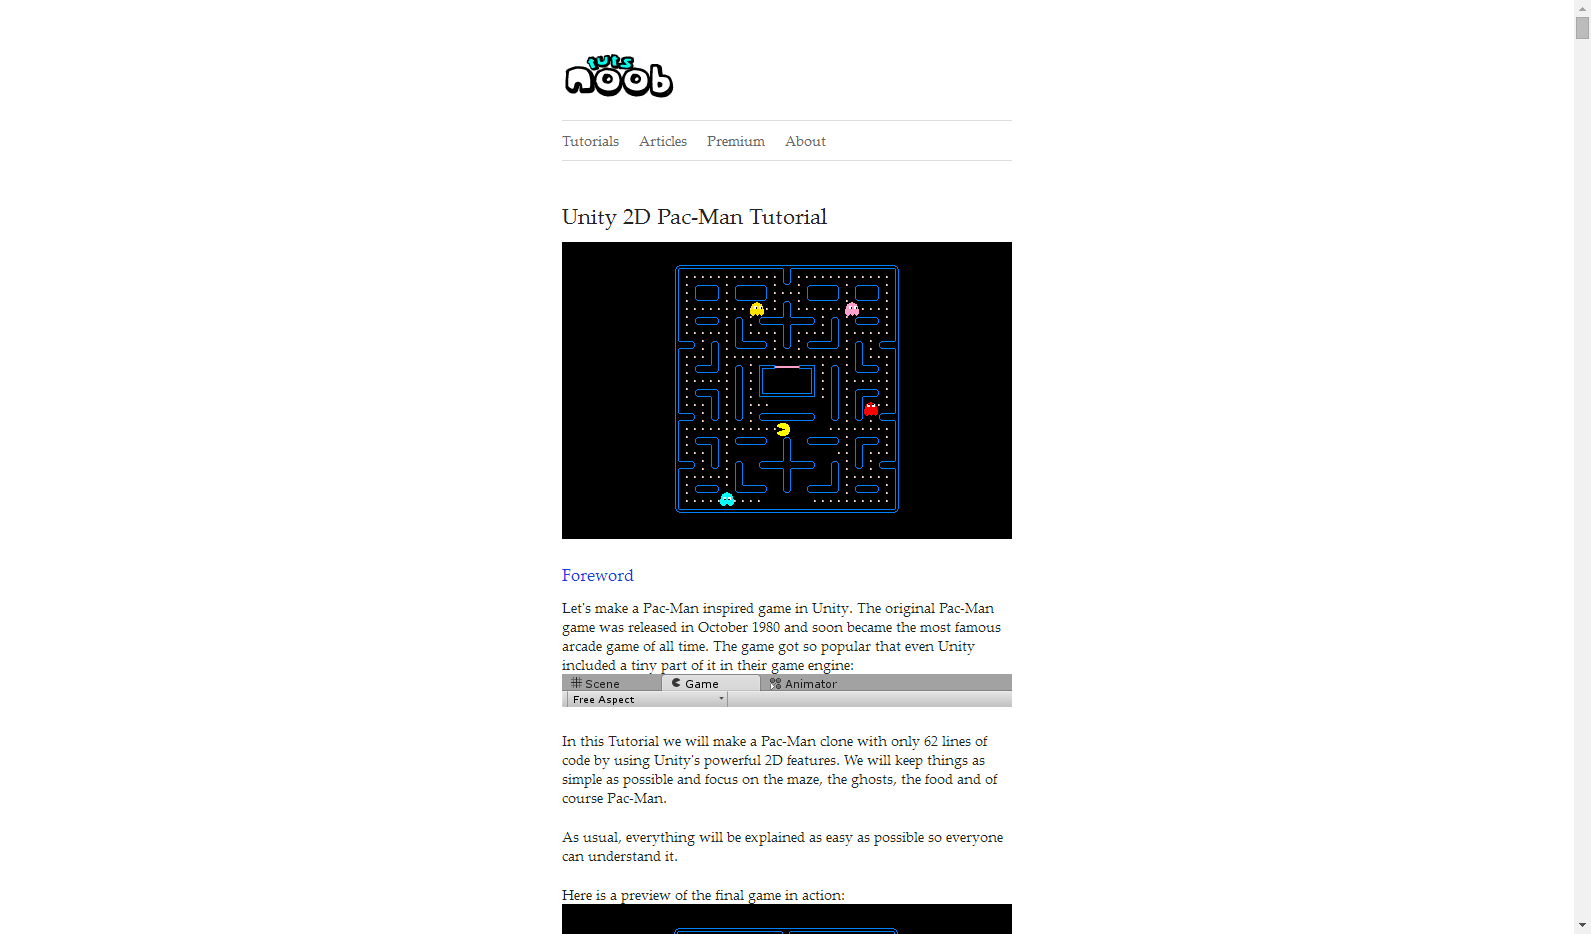 noobtuts - Unity 2D Pac-Man Tutorial | [Game Dev] Unity | Game dev